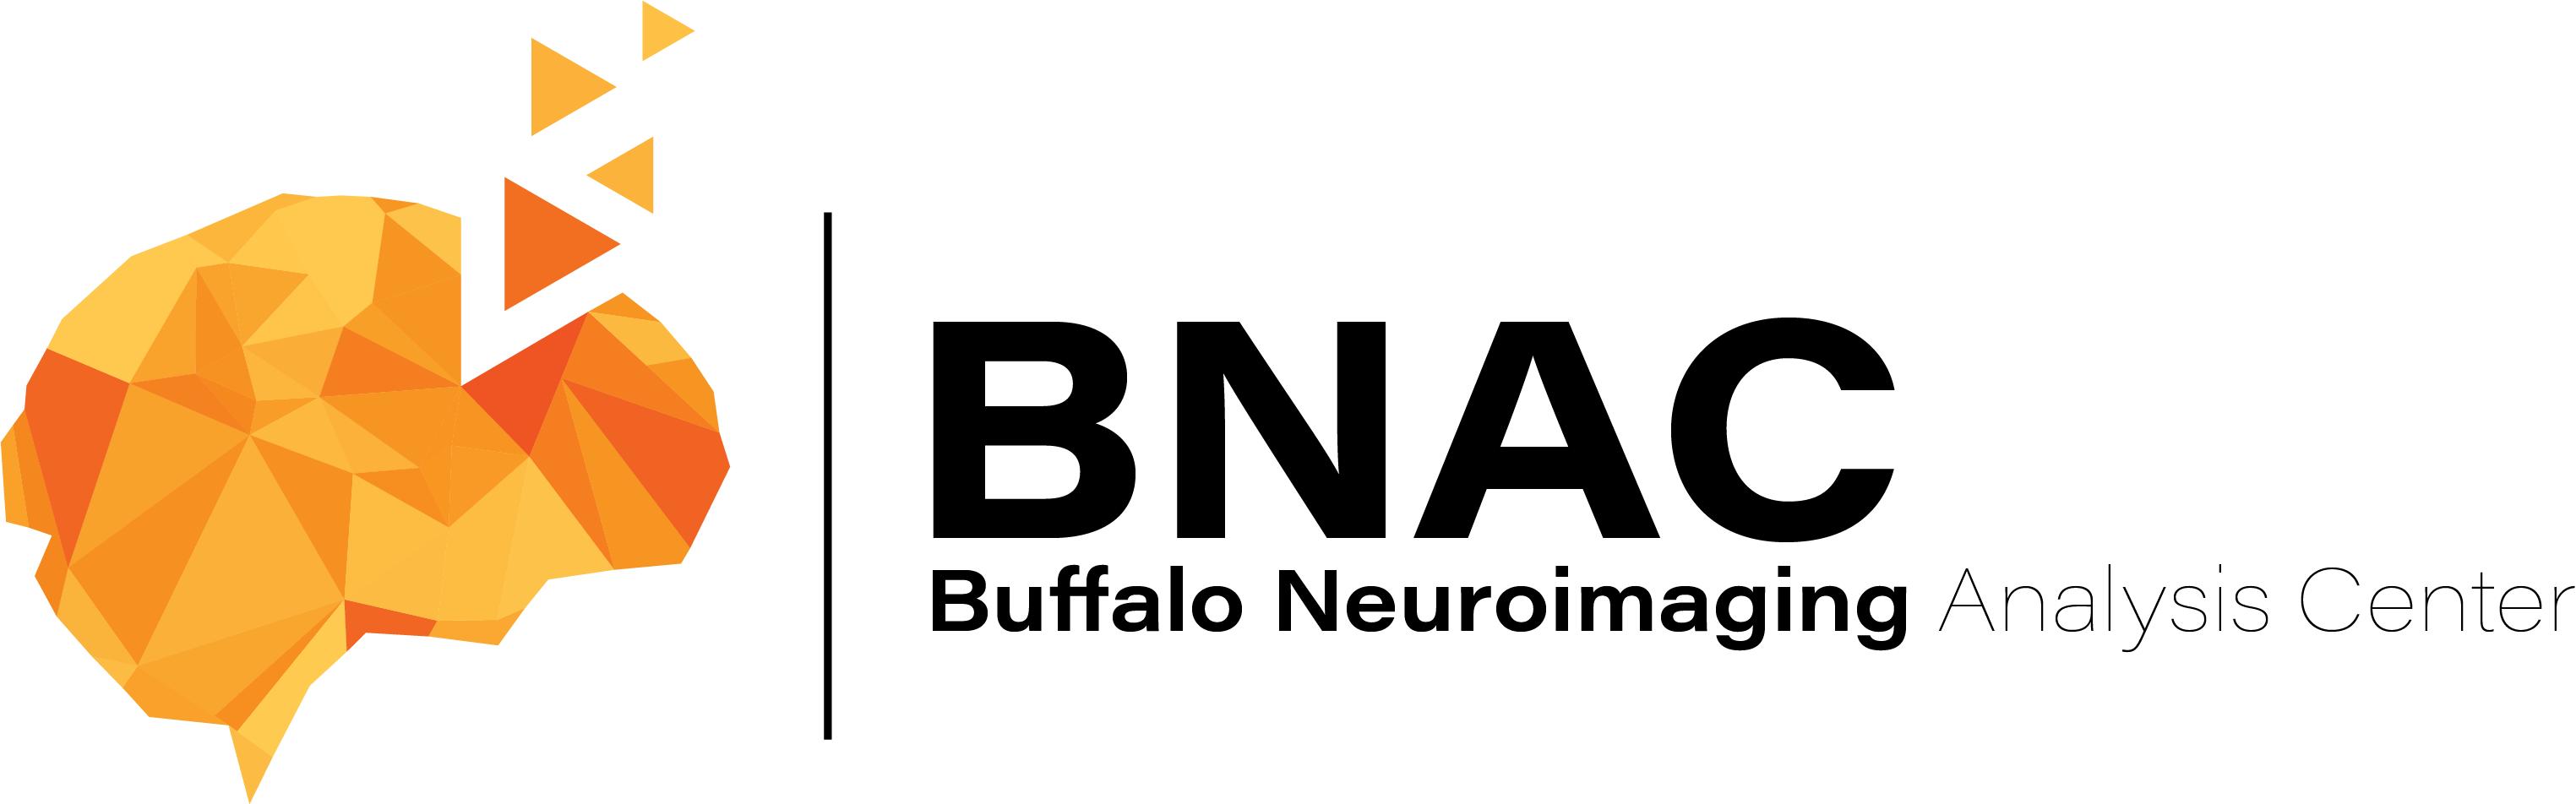 SAP Partner | <b>Buffalo Neuroimaging Analysis Center</b>